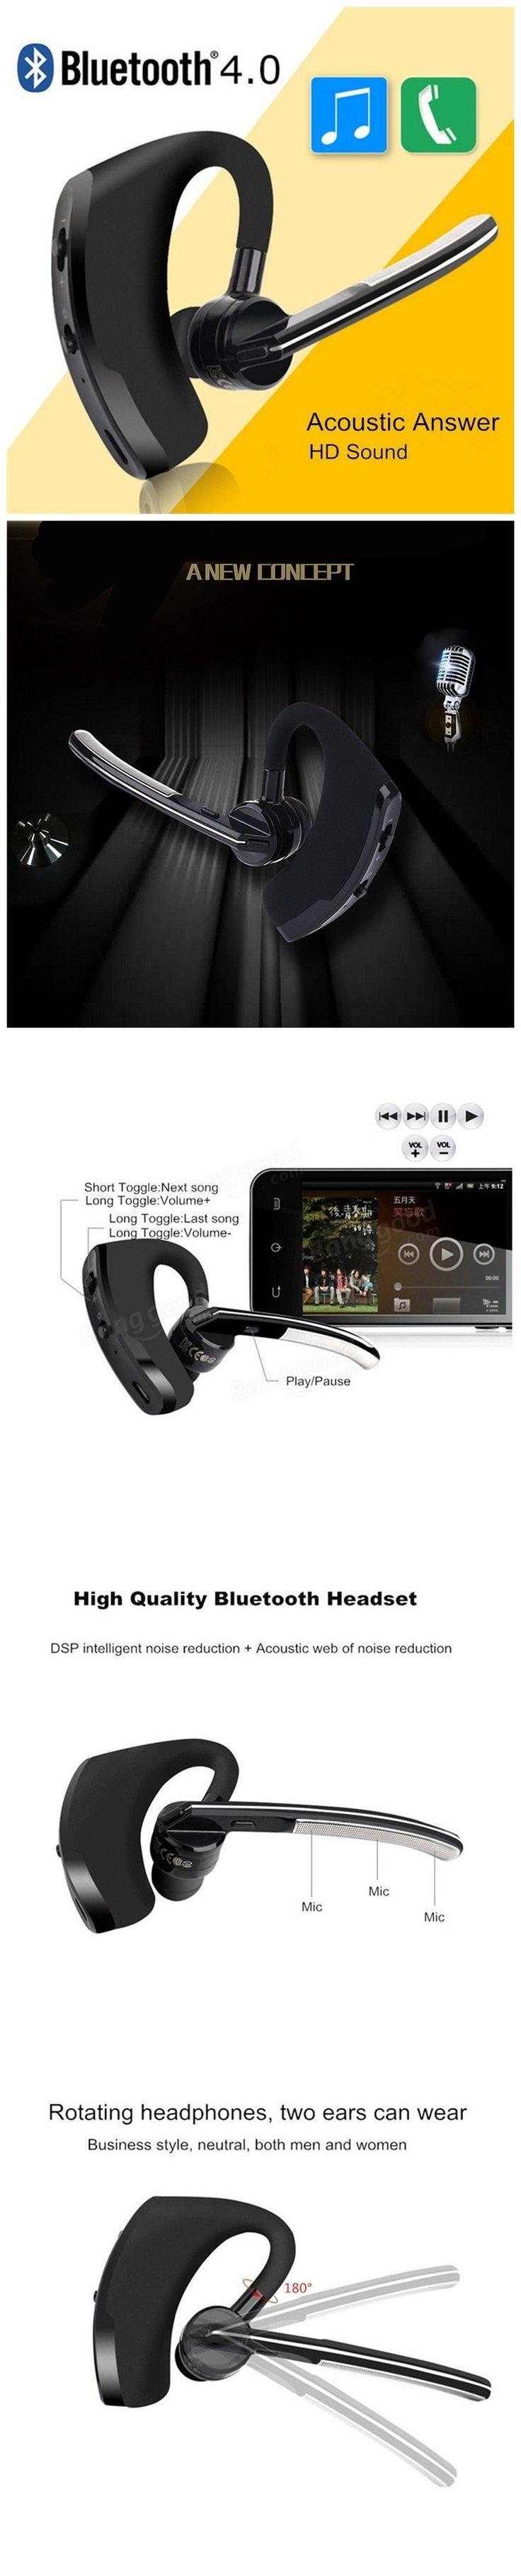 Wireless Bluetooth Earphone Stereo Headset Headphone Handsfree Universal For iPhone Samsung Xiaomi